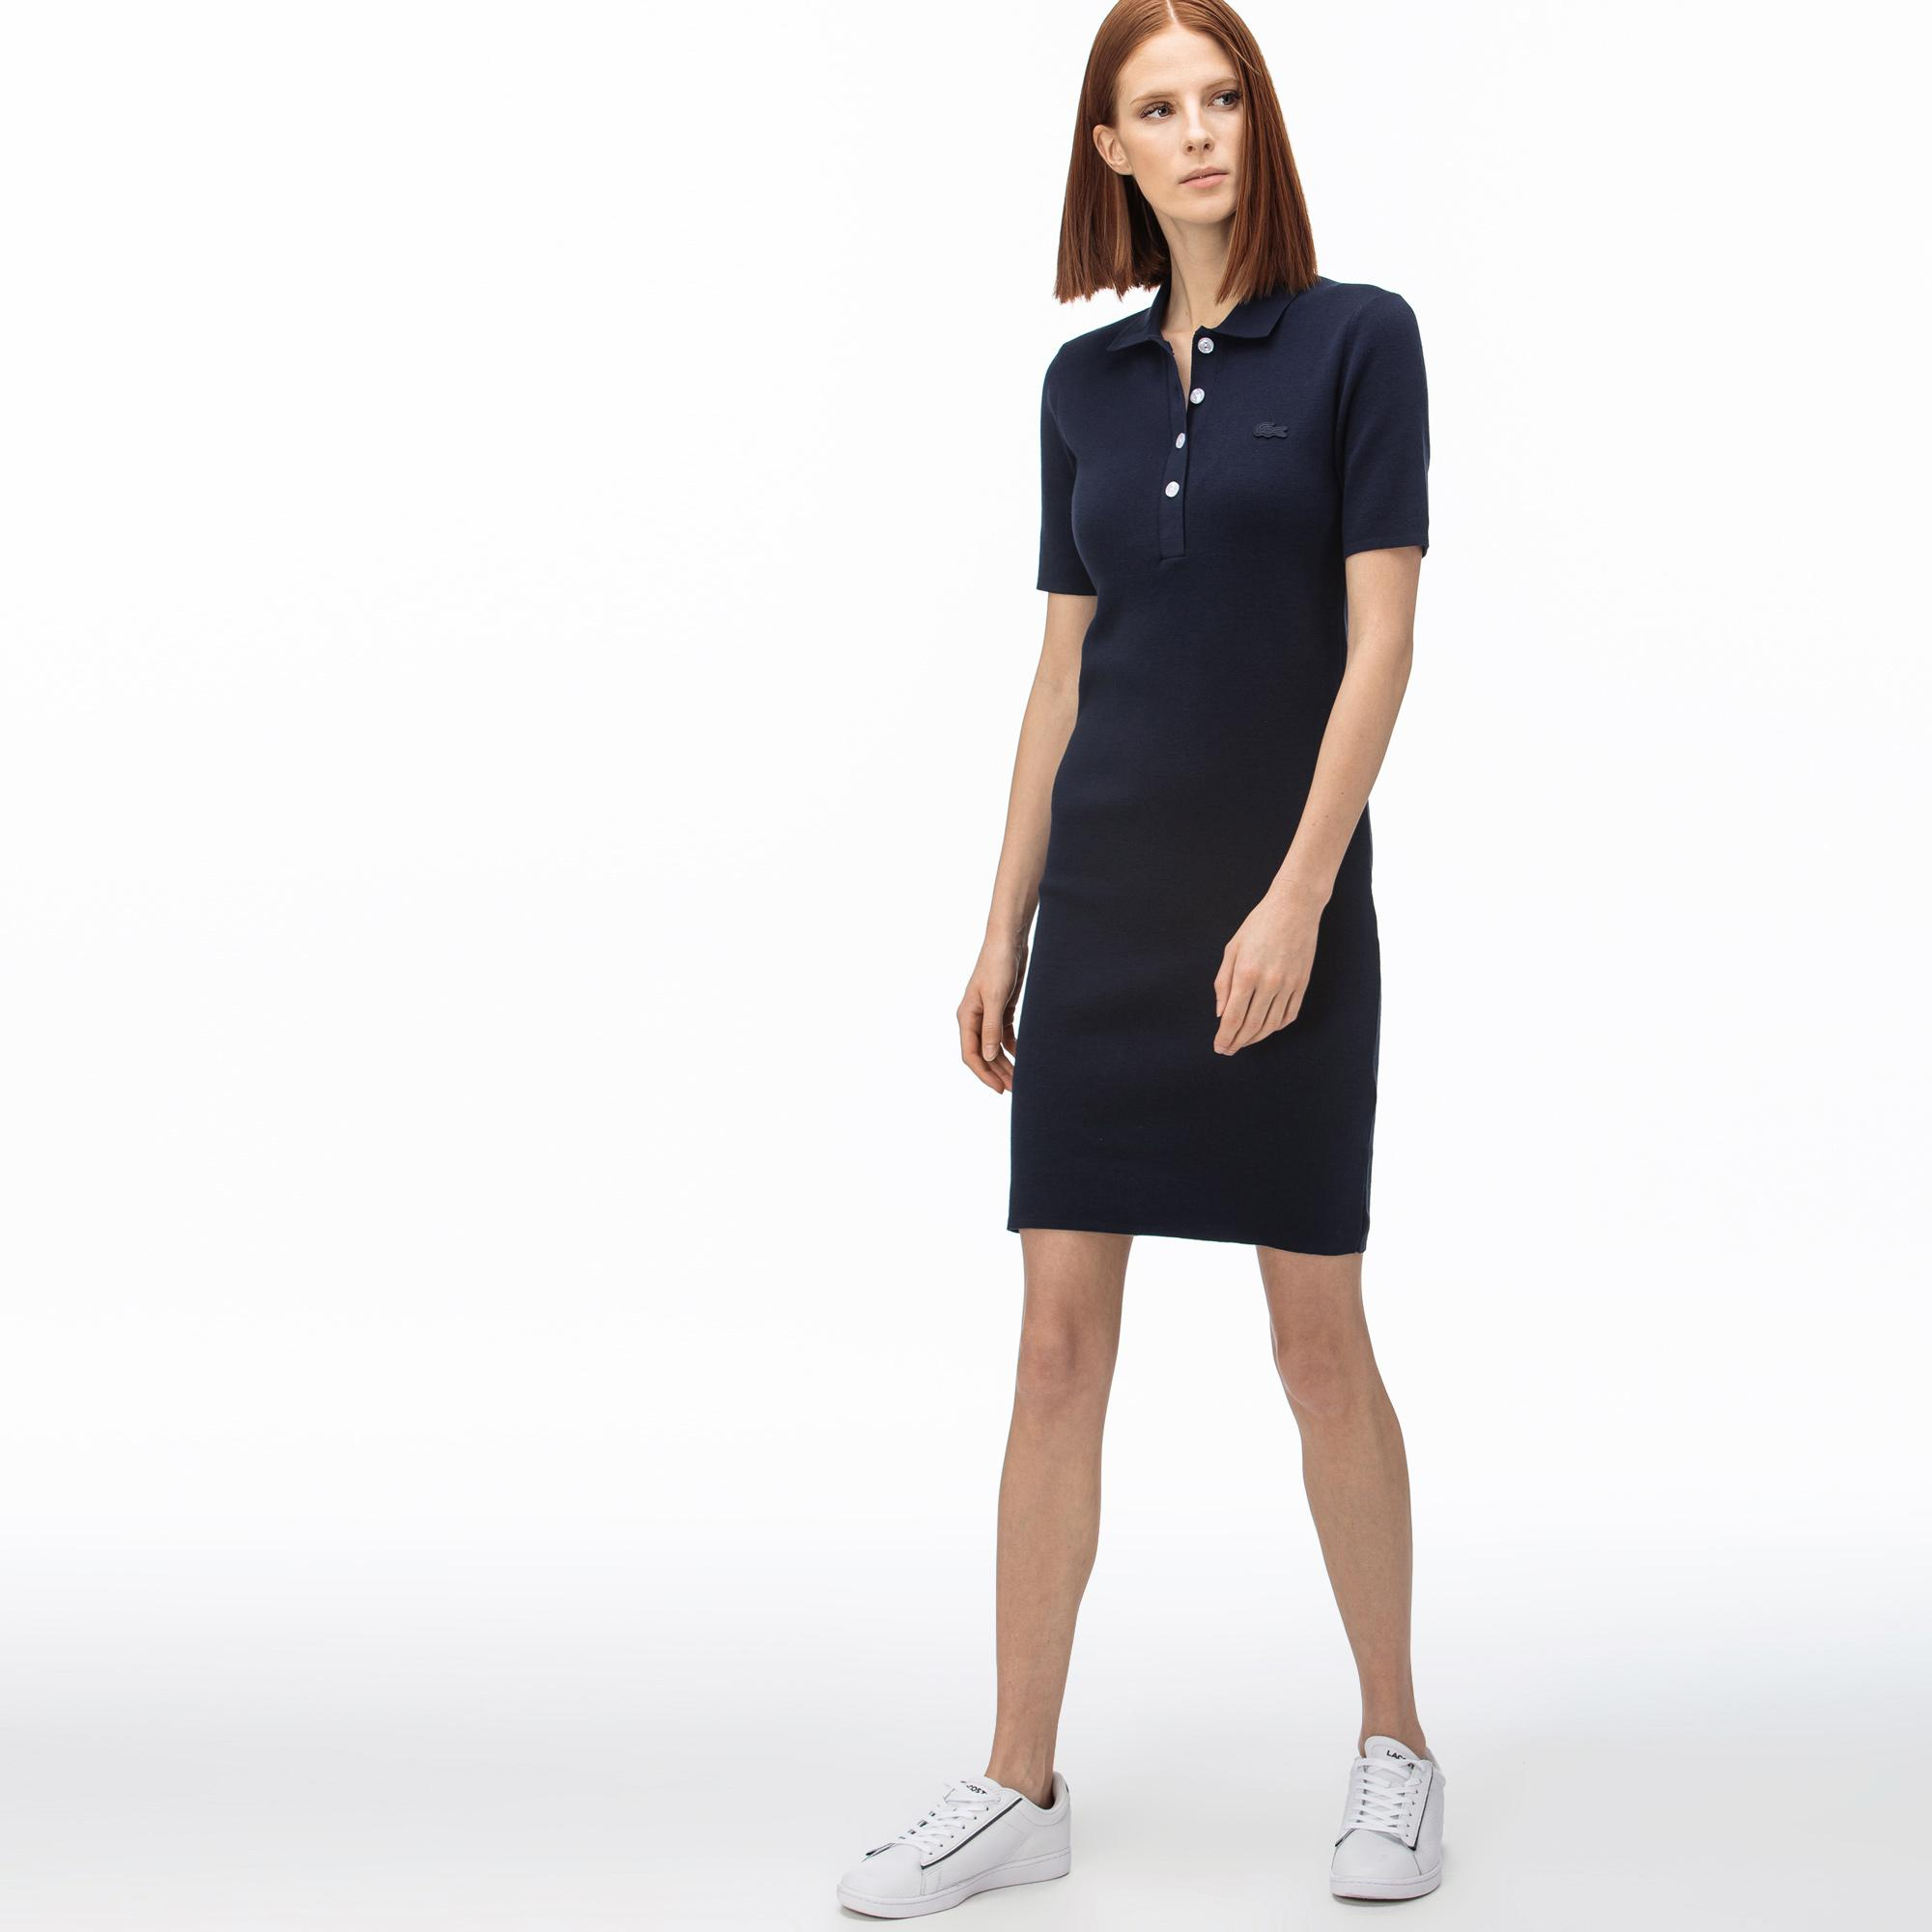 Lacoste Damska Dzianinowa Sukienka Polo